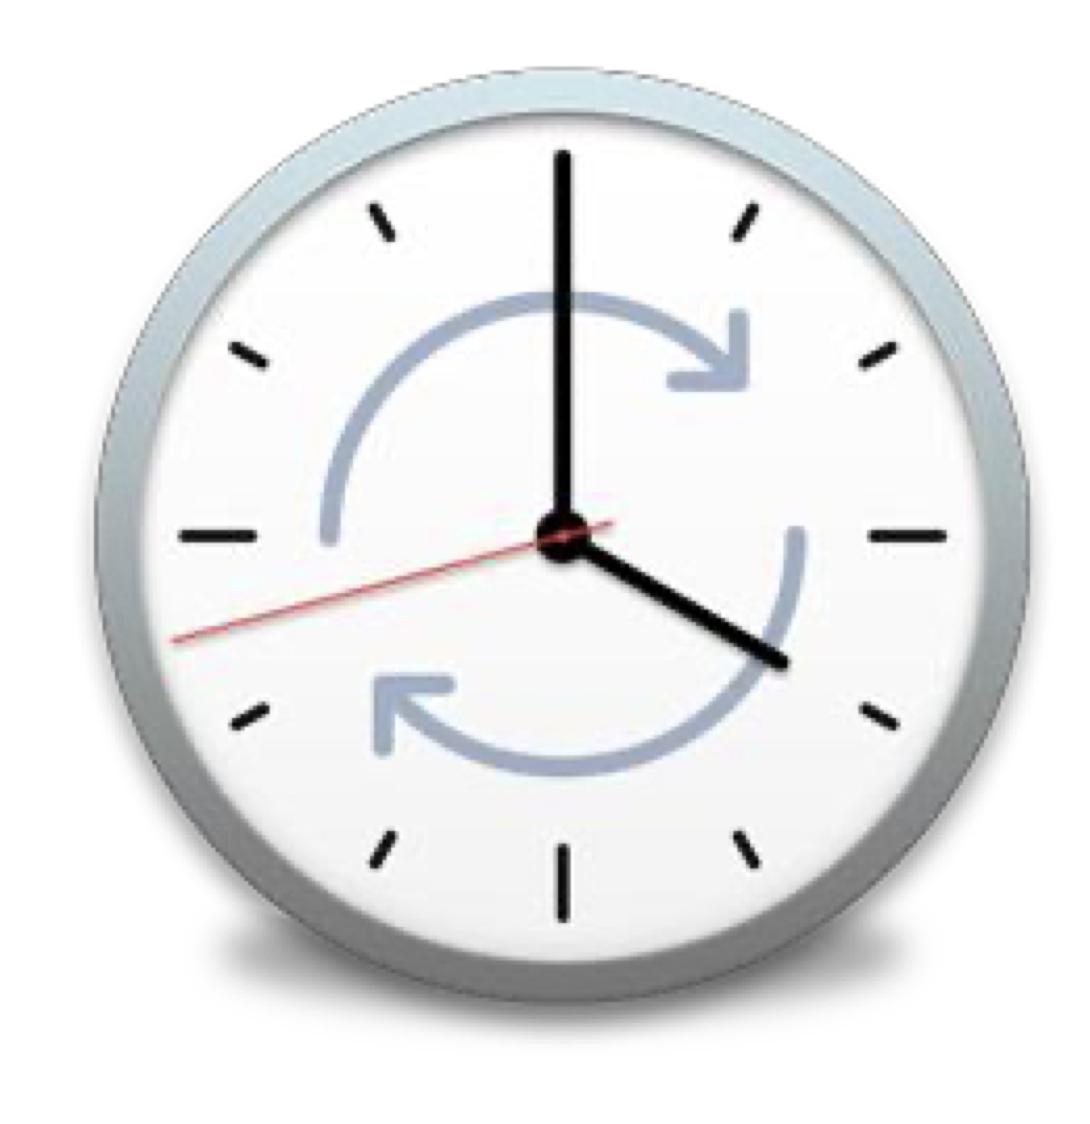 ChronoSync 4.9.10 fixes macOS Catalina bootable Issues